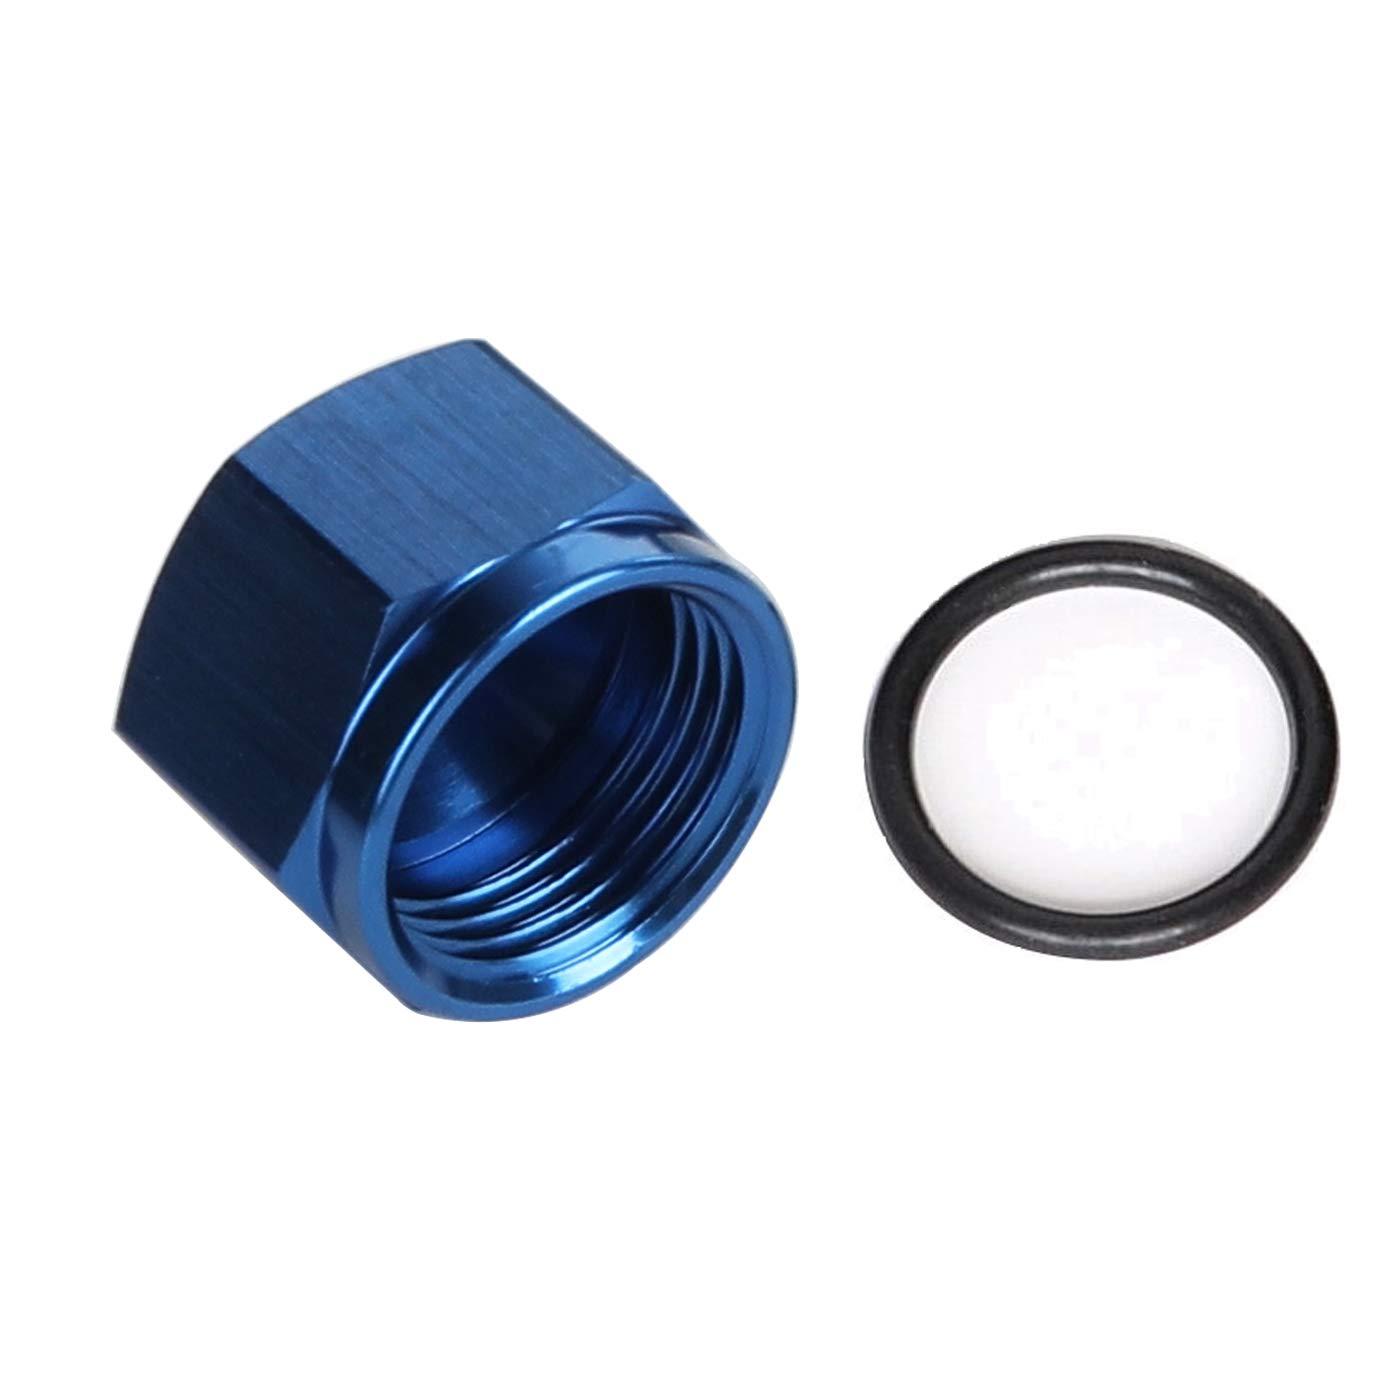 Aluminum Swivel Female 4AN AN4 Flare Cap For Hose Thread Hex Head Port Fitting Black